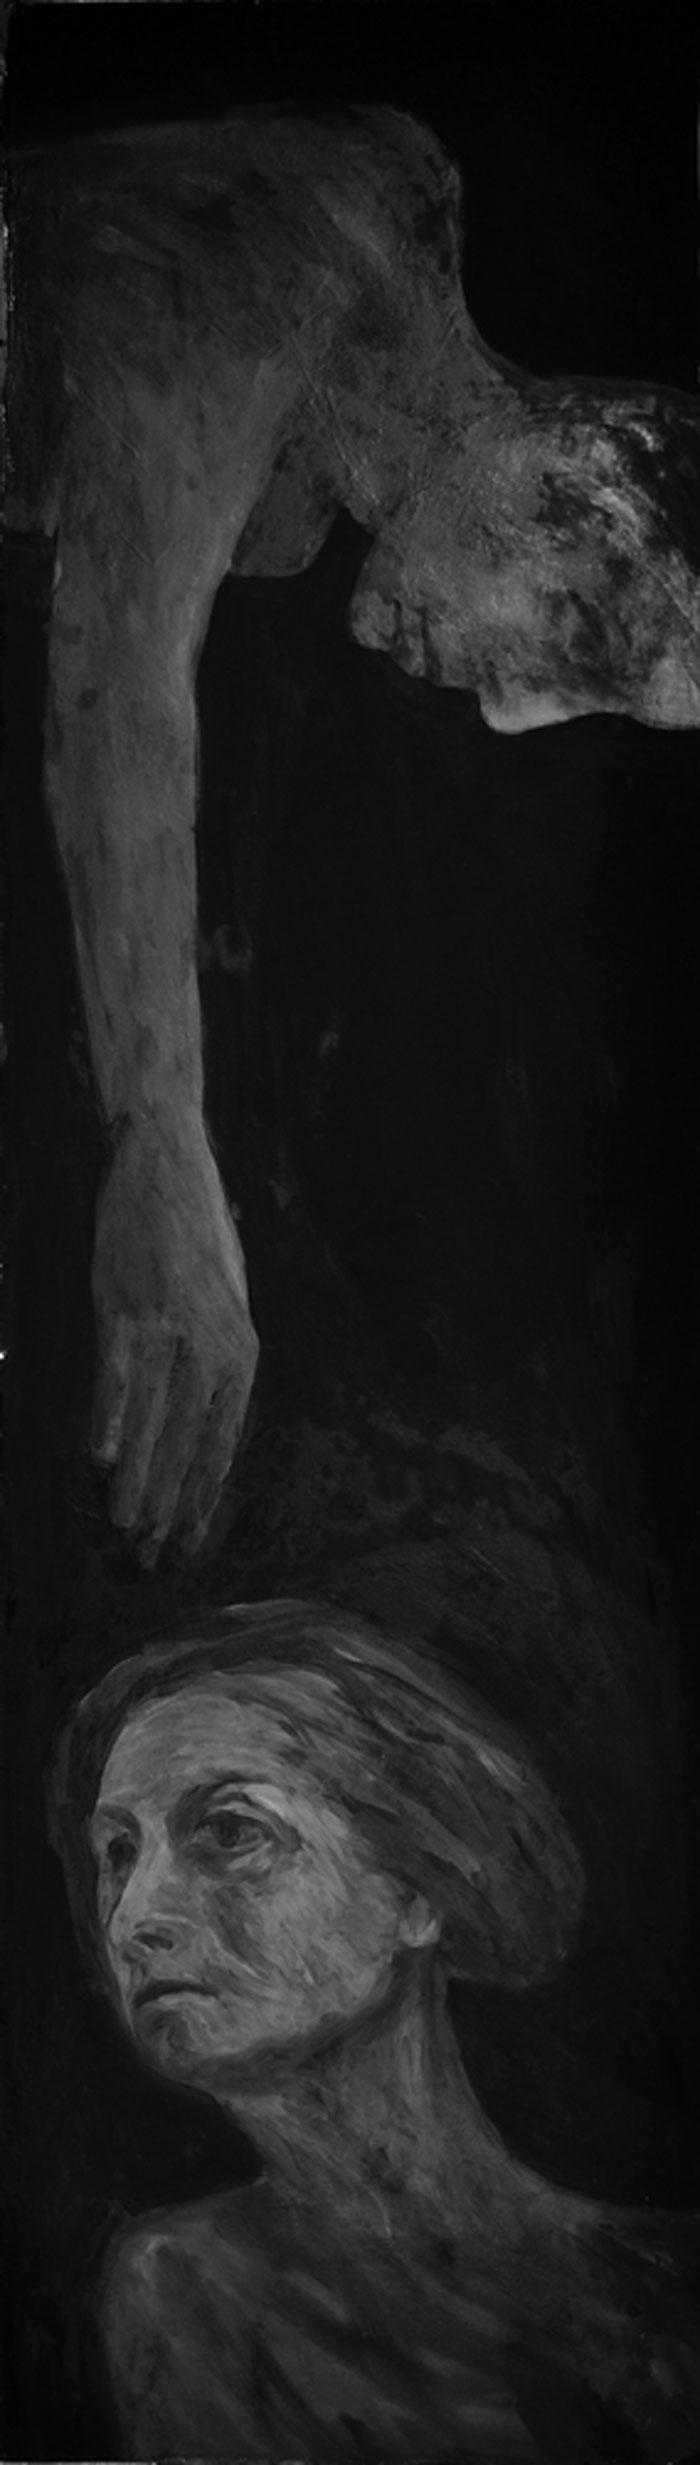 Anca Boeriu - Remomorari I, ulei pe lemn, 170x48 cm